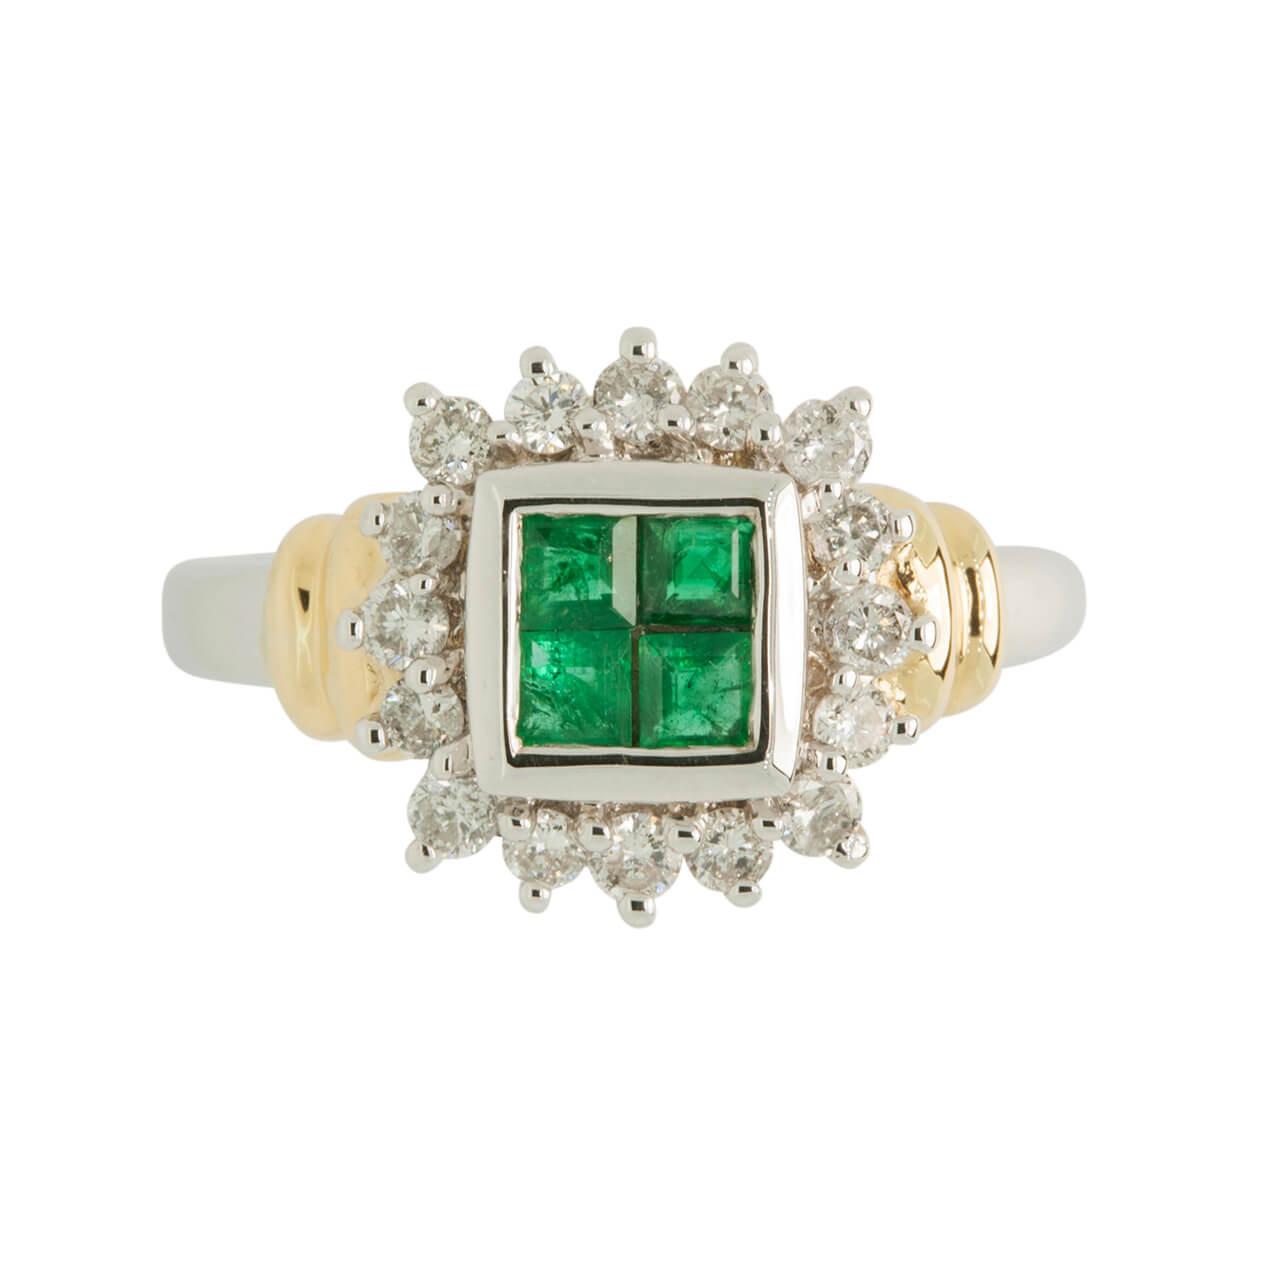 b1f131b4d Second Hand Emerald & Diamond 18ct Gold Dress Ring